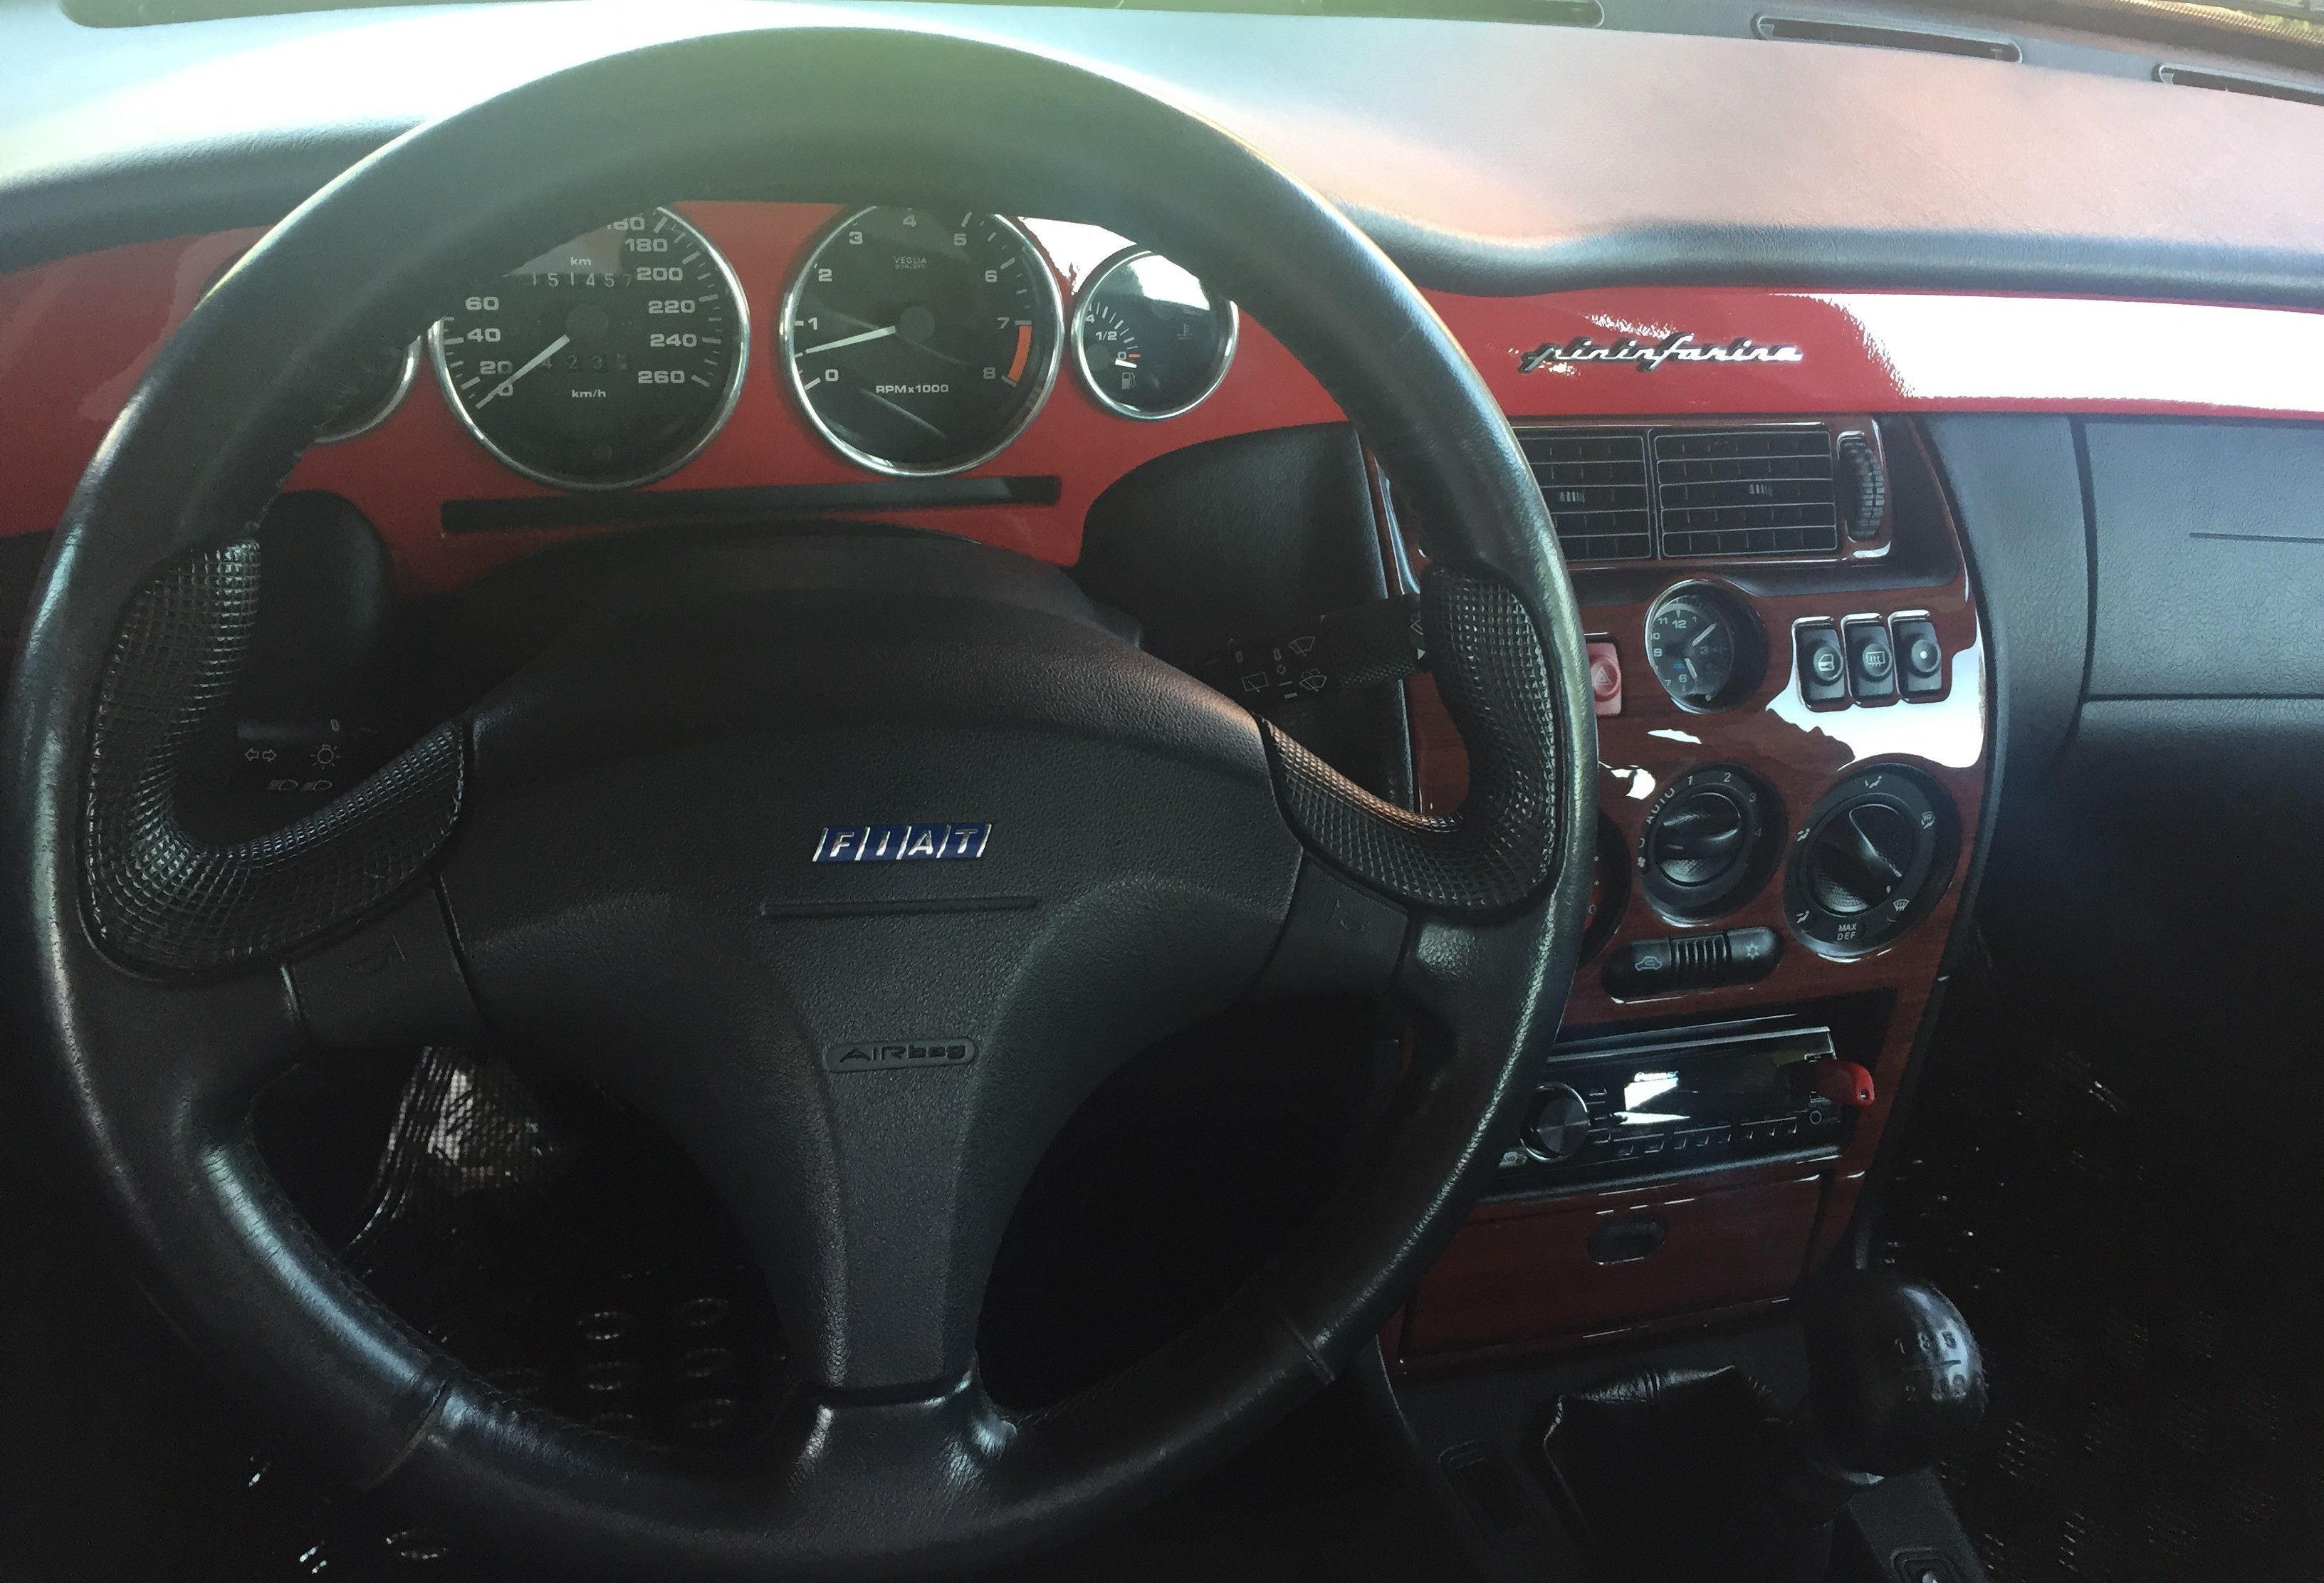 Fiat Coupe 20v Turbo Interior